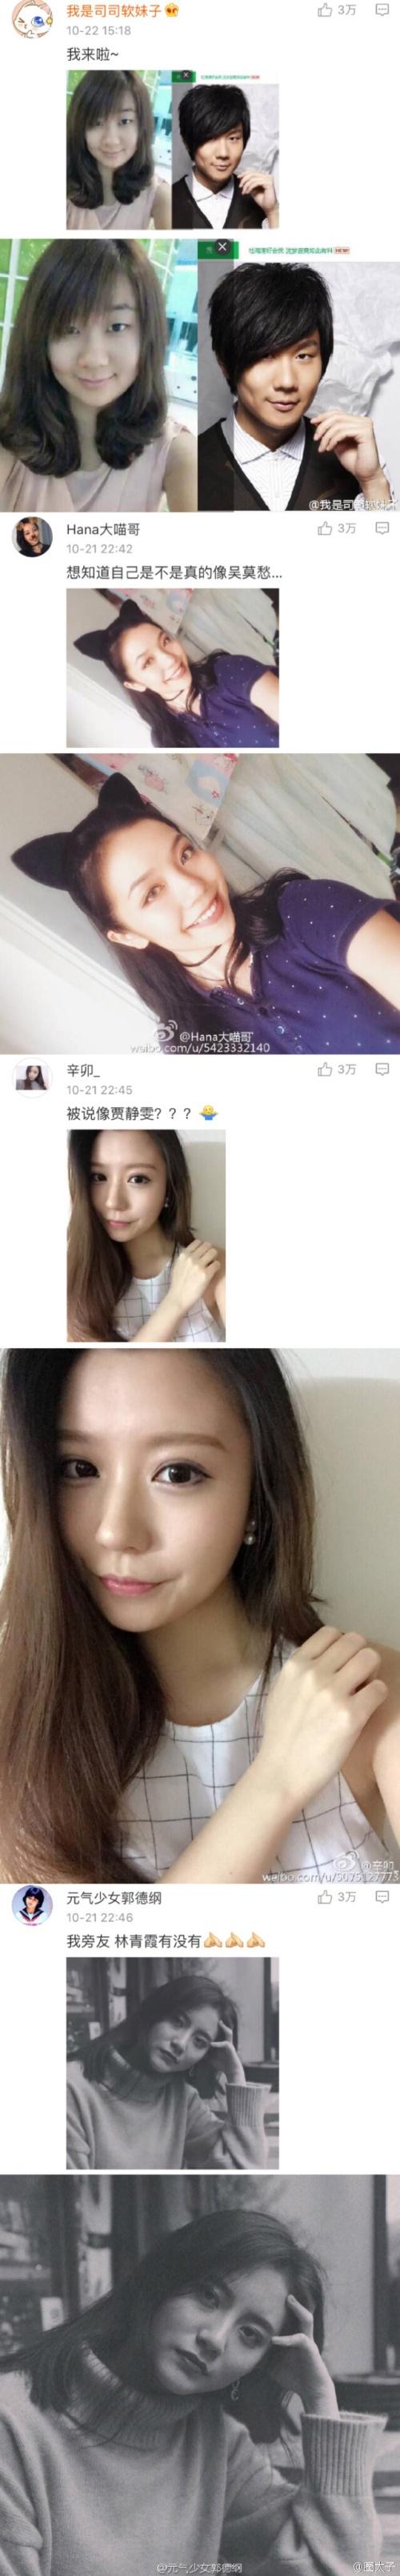 mingxing2